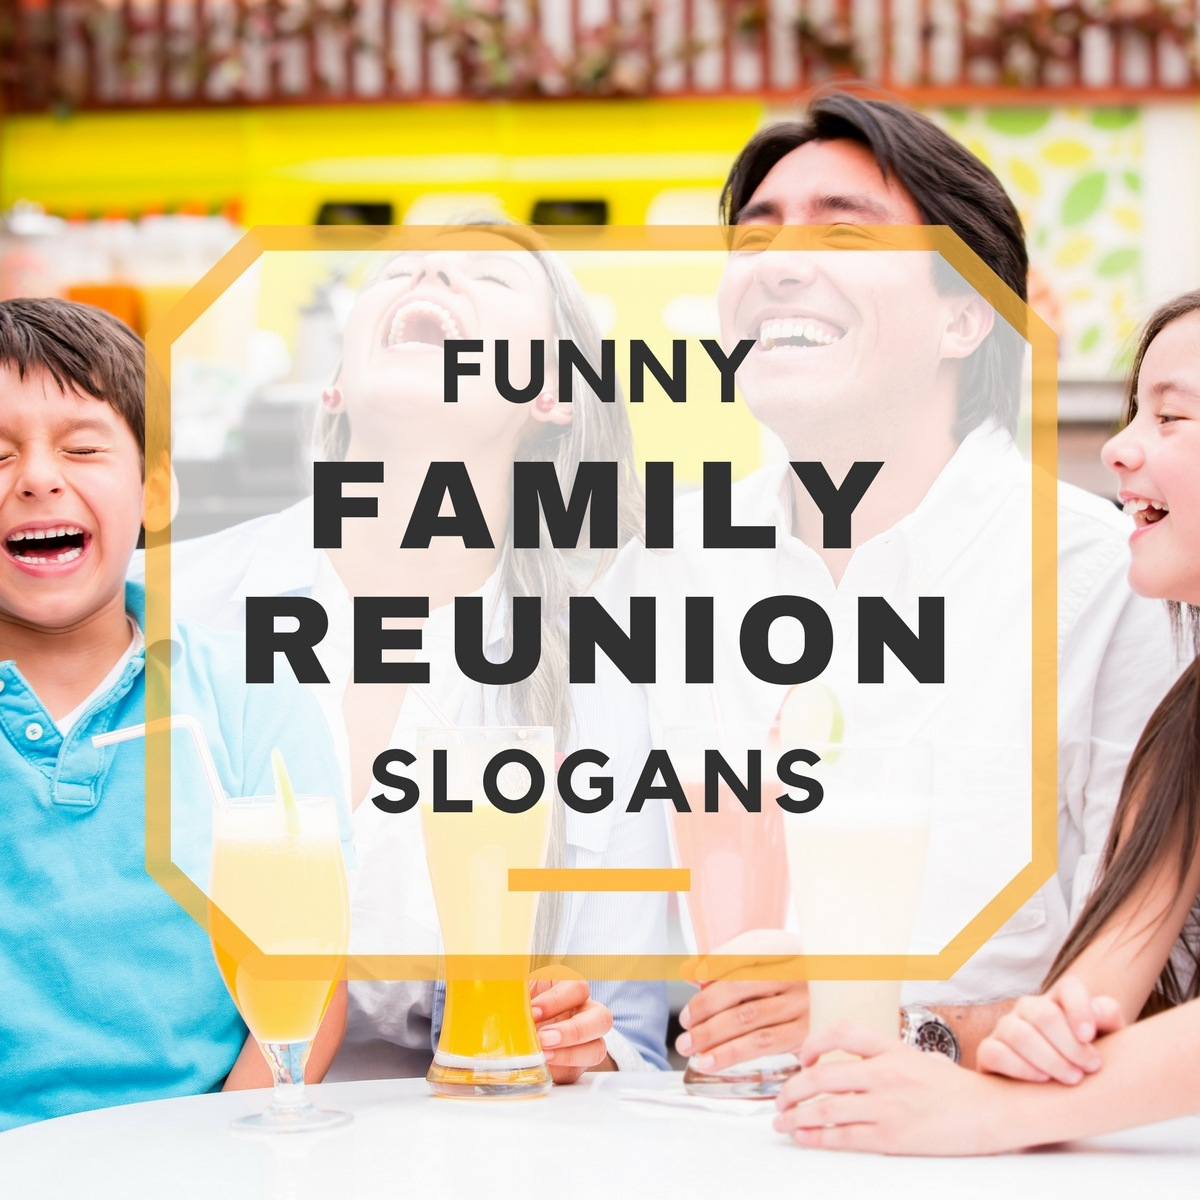 25 Funny Family Reunion Slogans